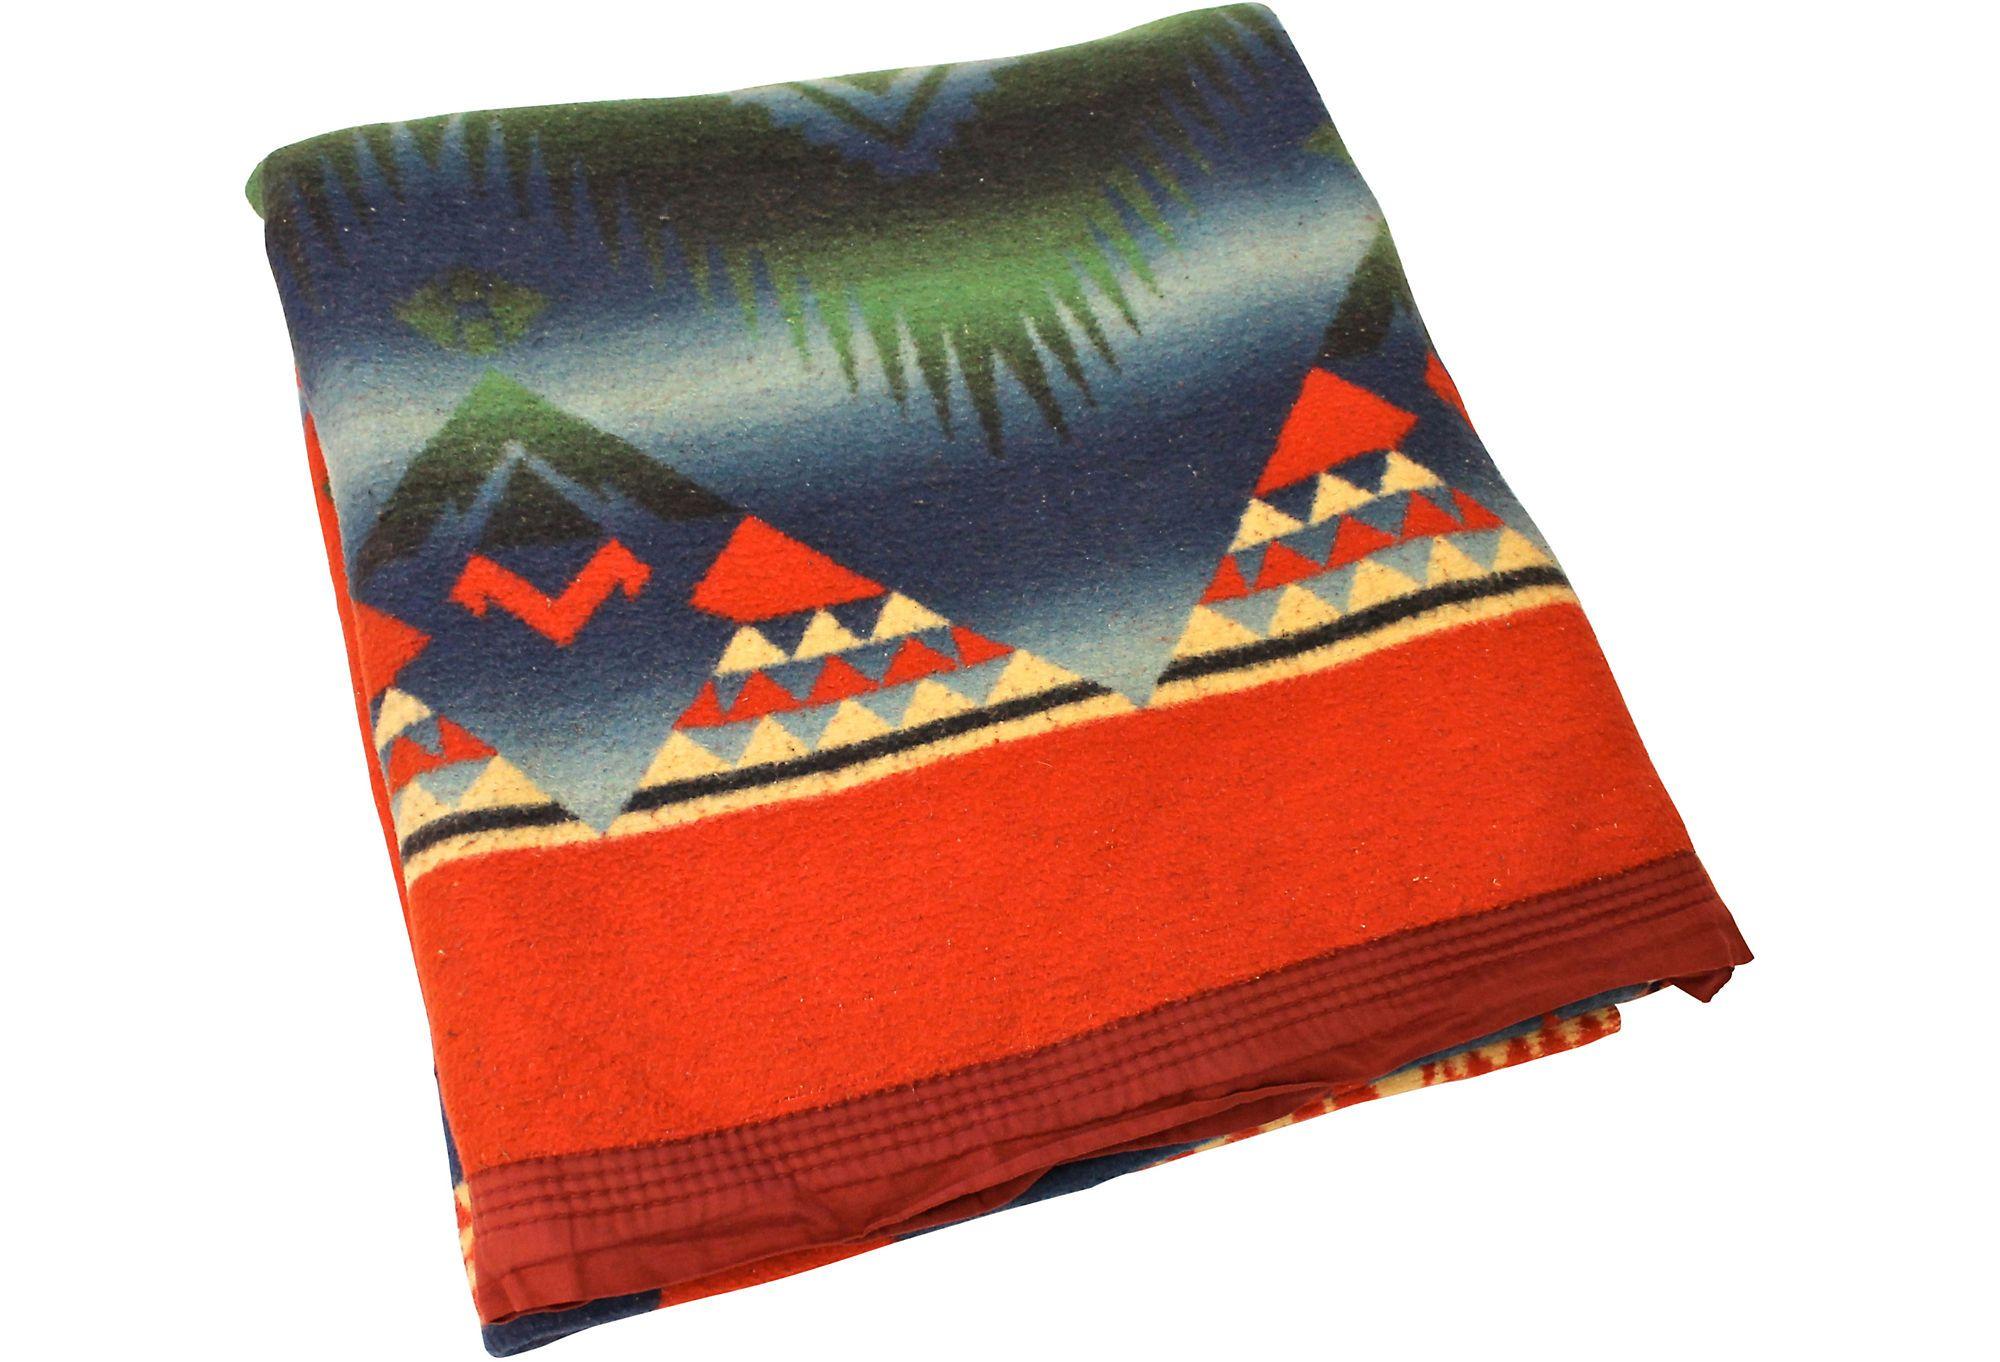 Vintage Camp Blanket Textiles Camping